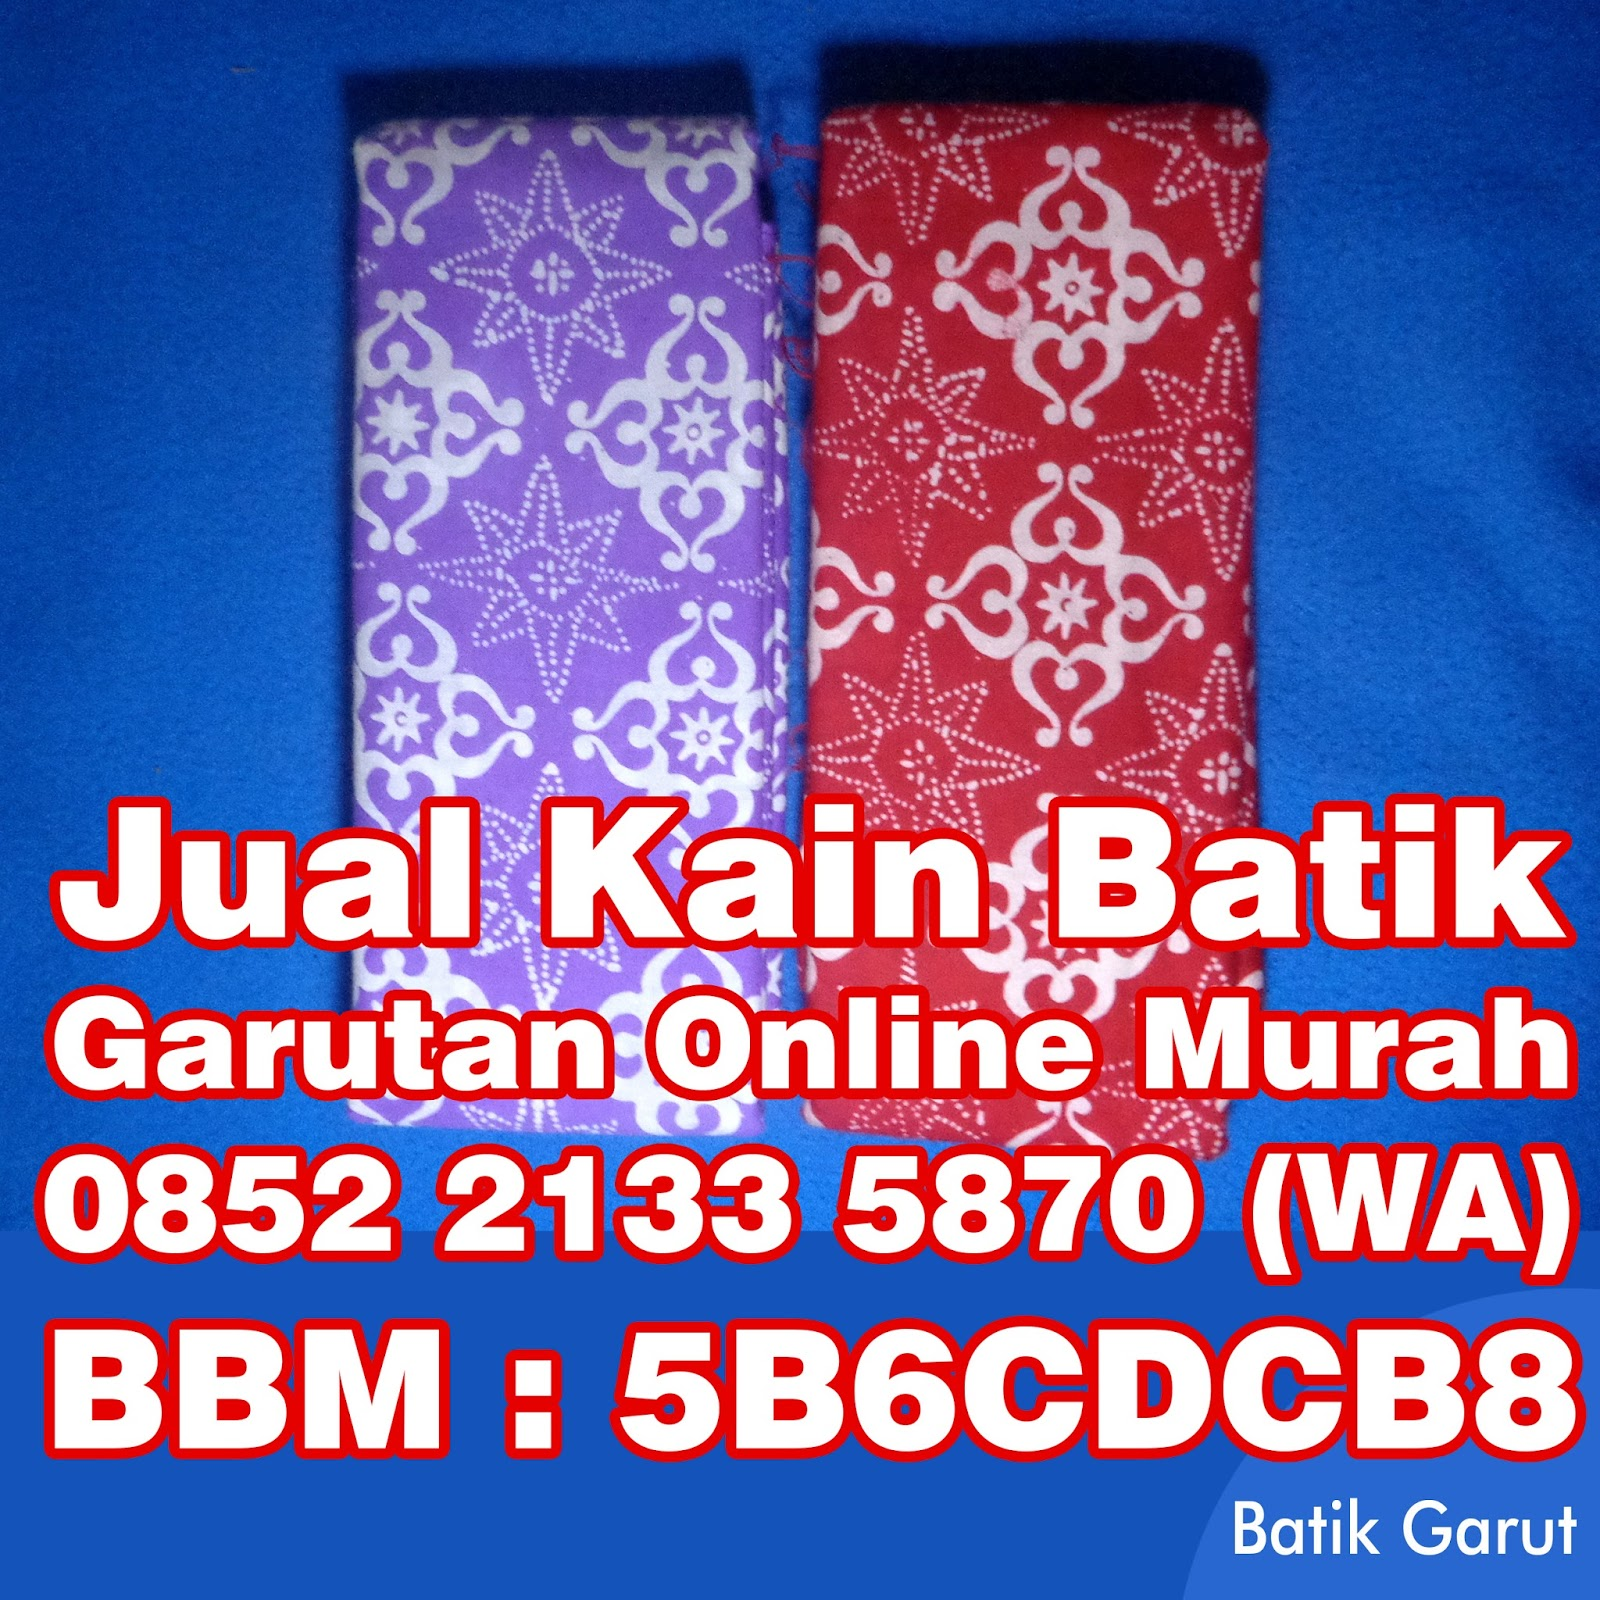 Batik Garut Batik Garutan WA 0852 2133 5870 Batik Tulis Garut